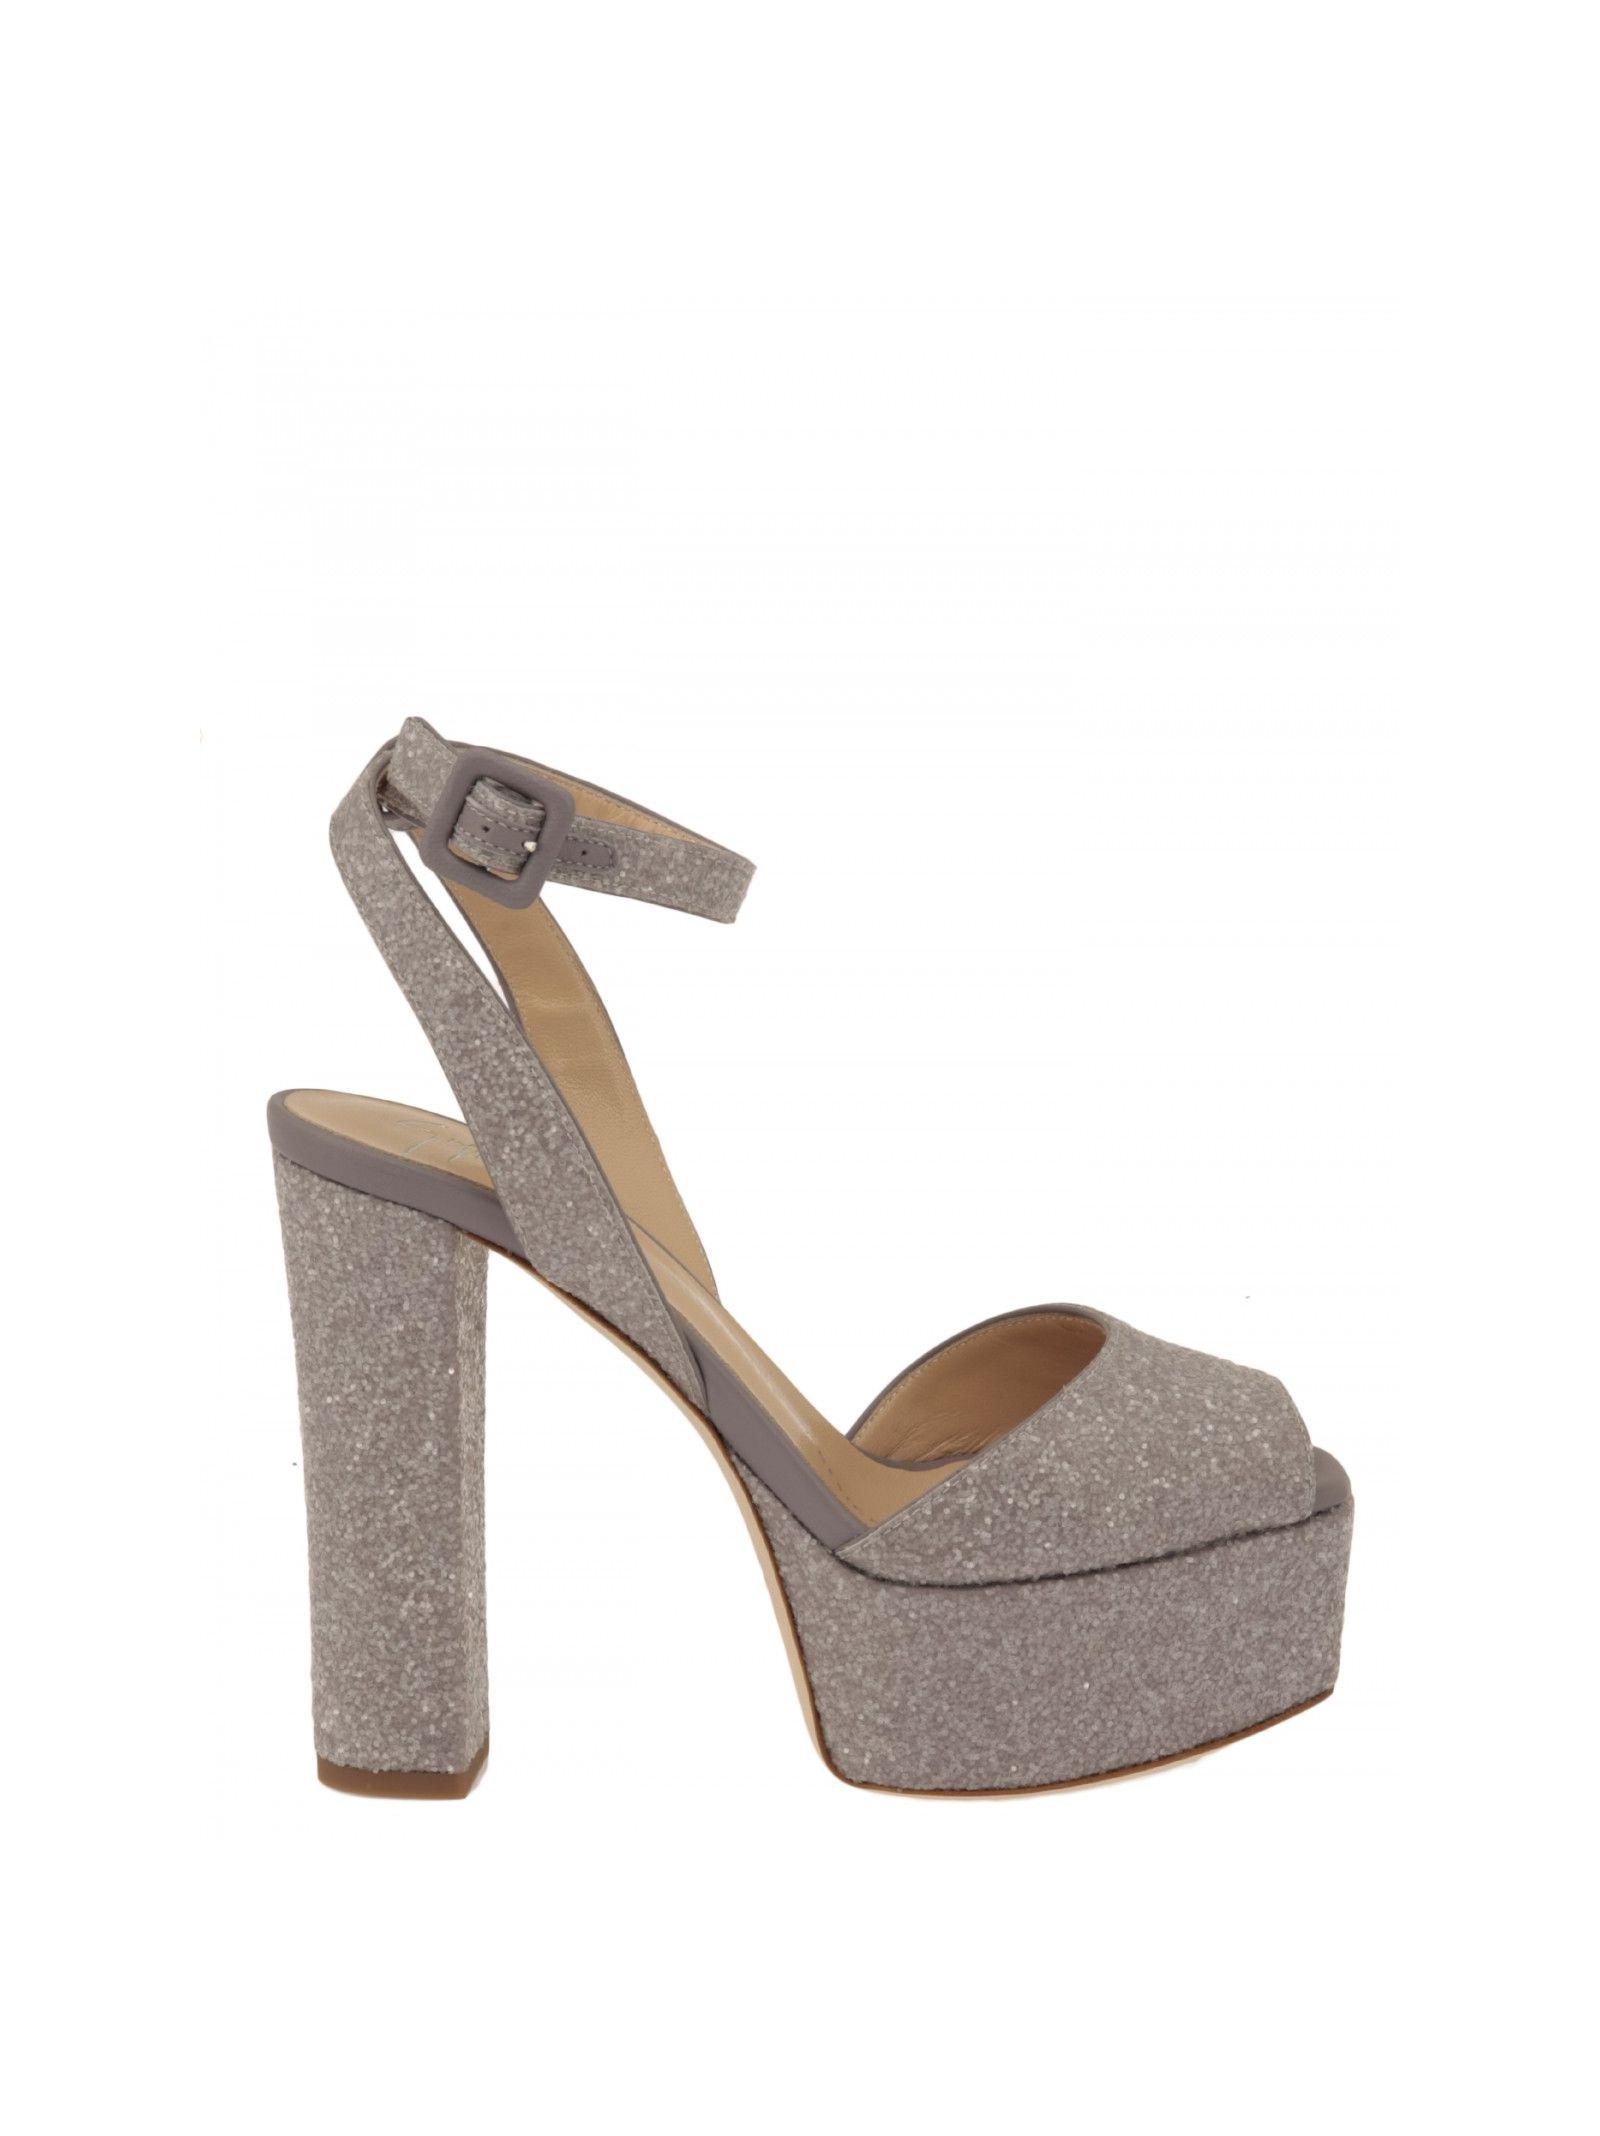 giuseppe zanotti female giuseppe zanotti design sandals with glitter